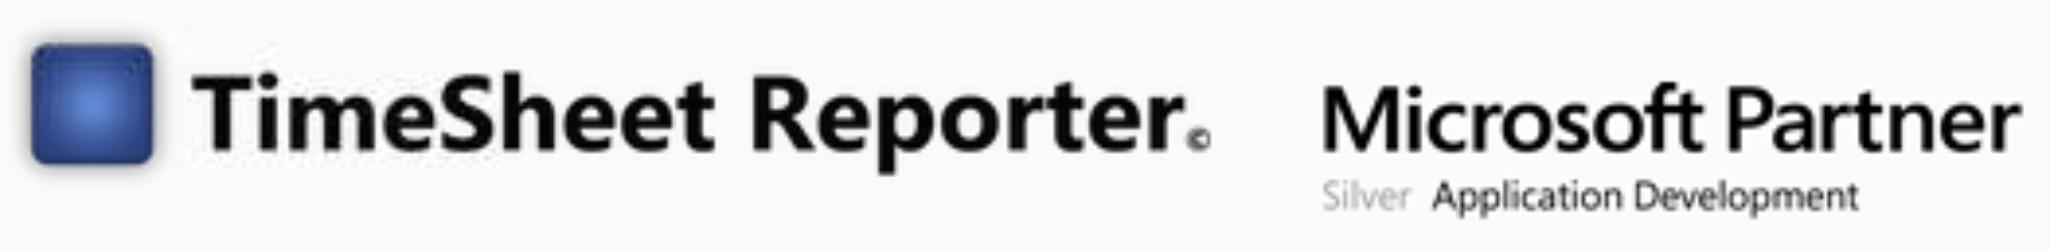 Consultant Timesheet Reporting – TimeSheet Reporter